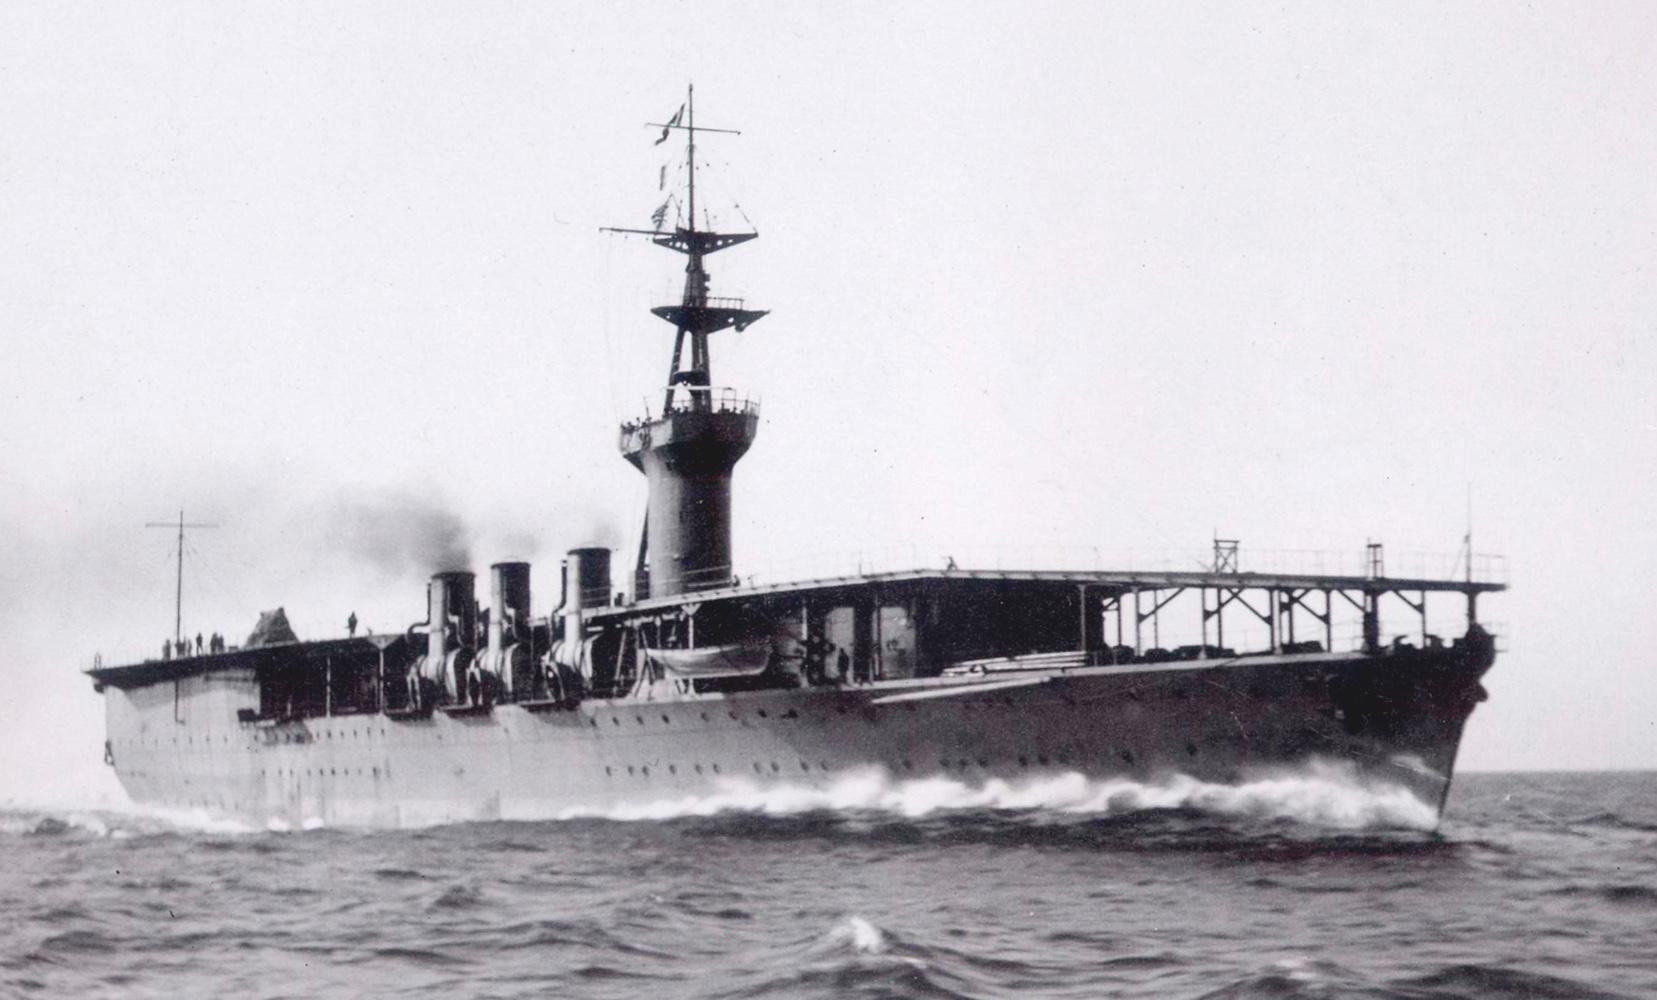 Japanese_aircraft_carrier_Hosho_1922_PUBLIC20DOMAIN_cmyk-fe39185